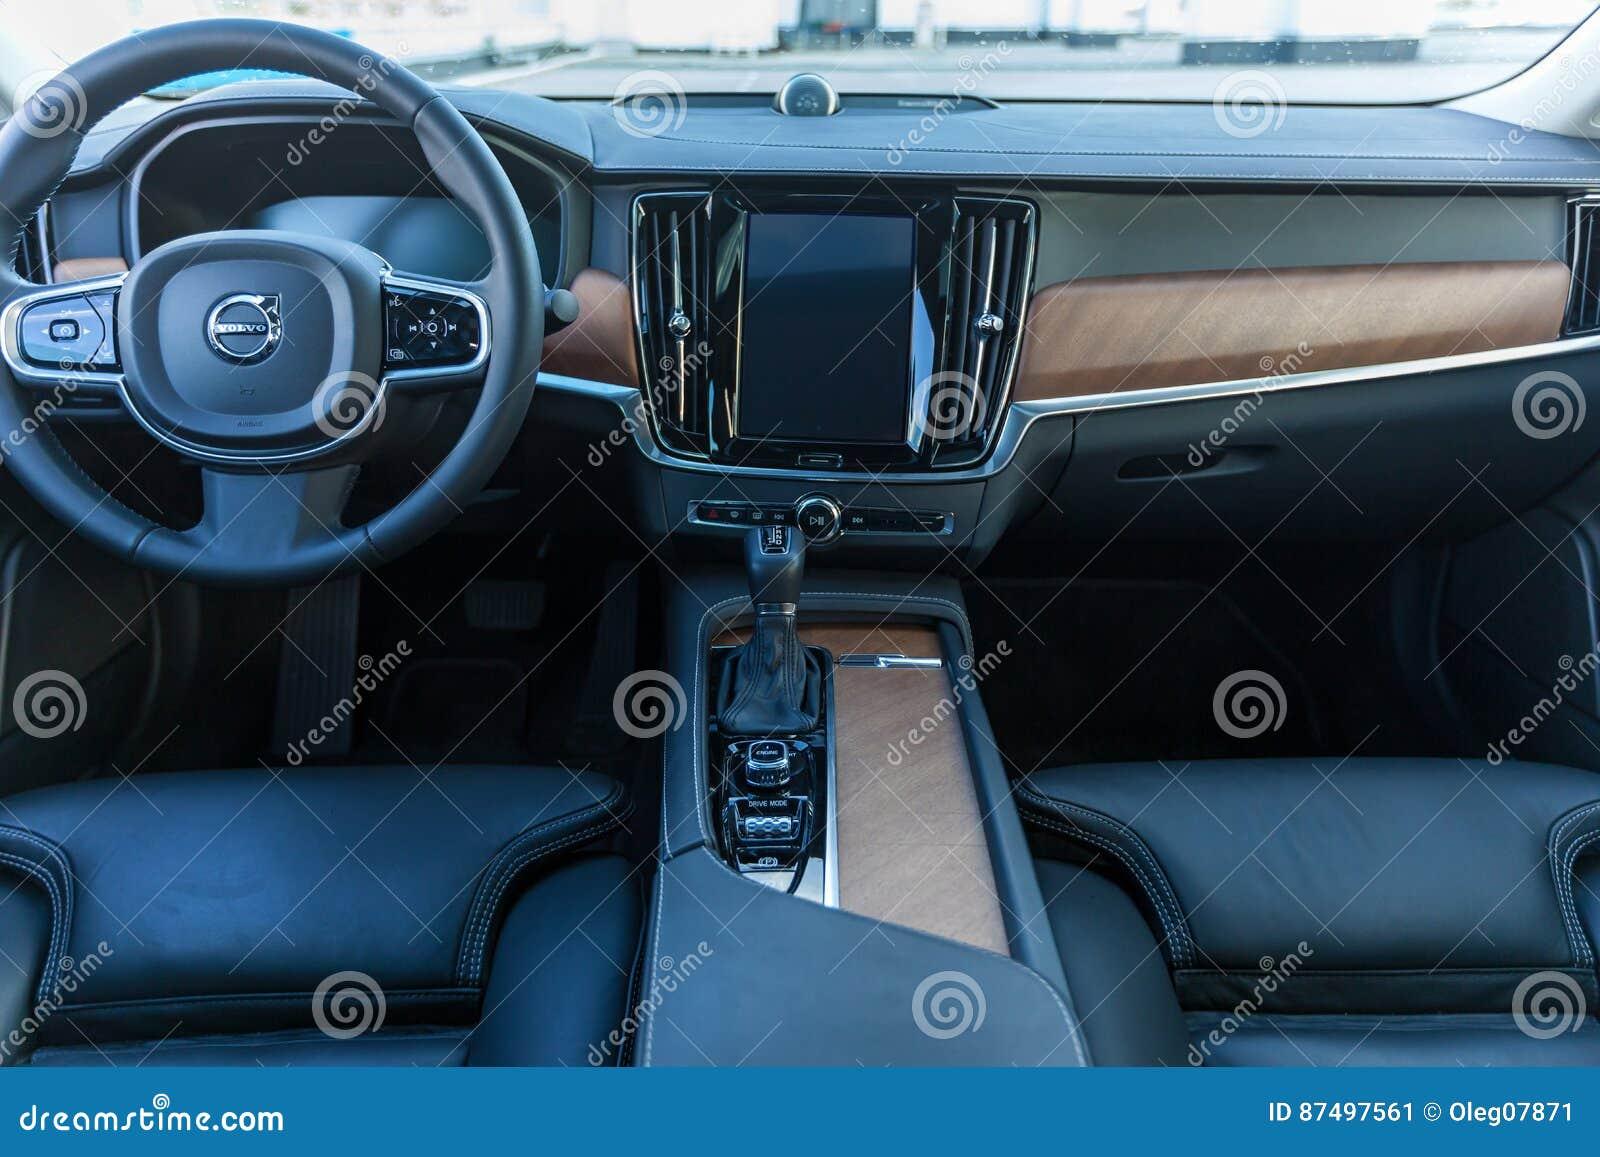 Volvo S90 Interior >> Interior Car Volvo S90 Editorial Photo Image Of Automotive